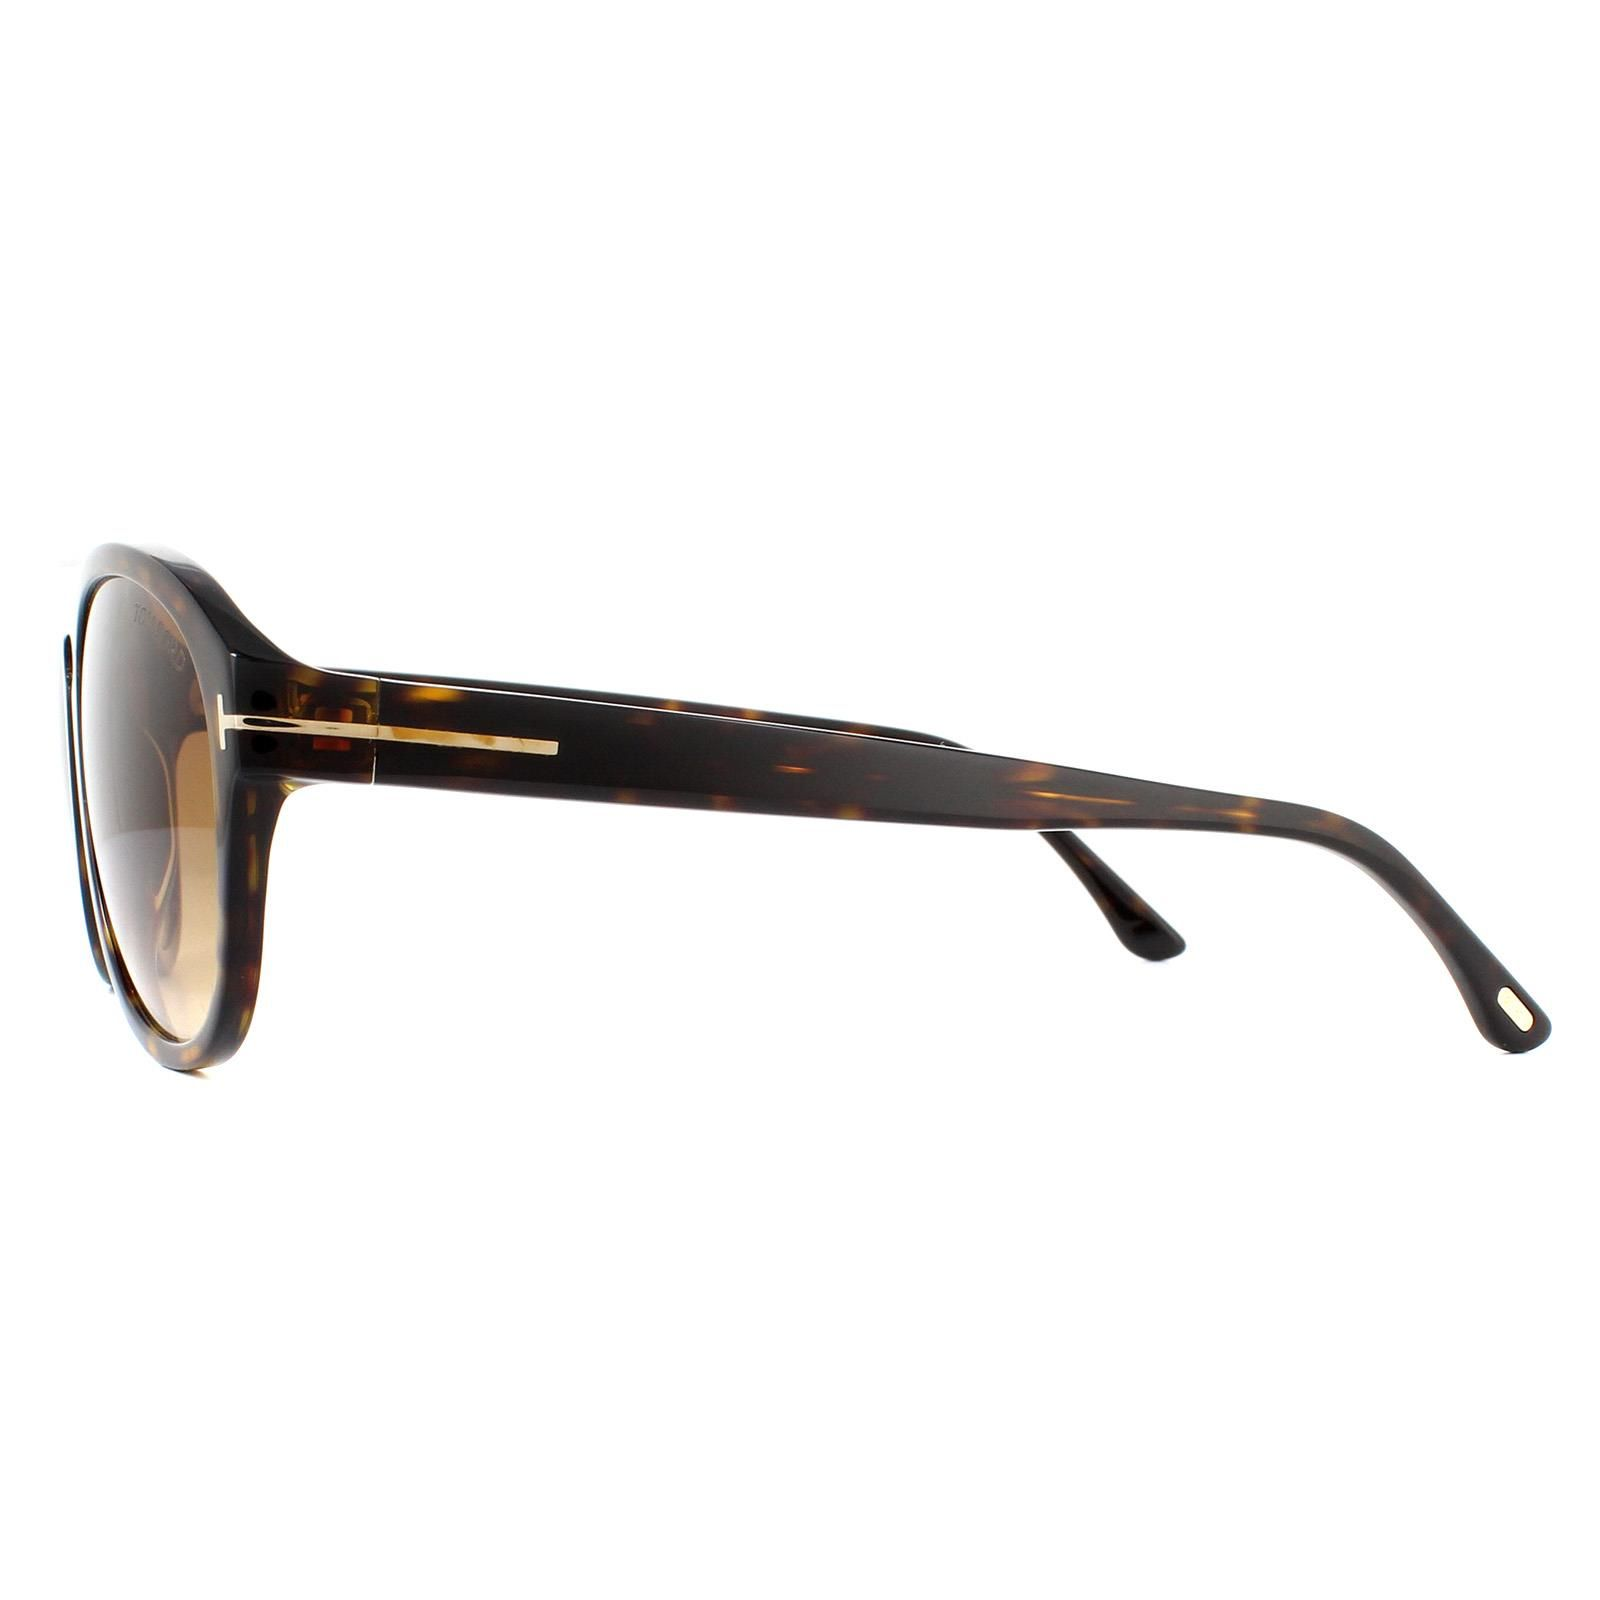 Tom Ford Sunglasses Austin-02 FT0677 52F Dark Havana Brown Gradient